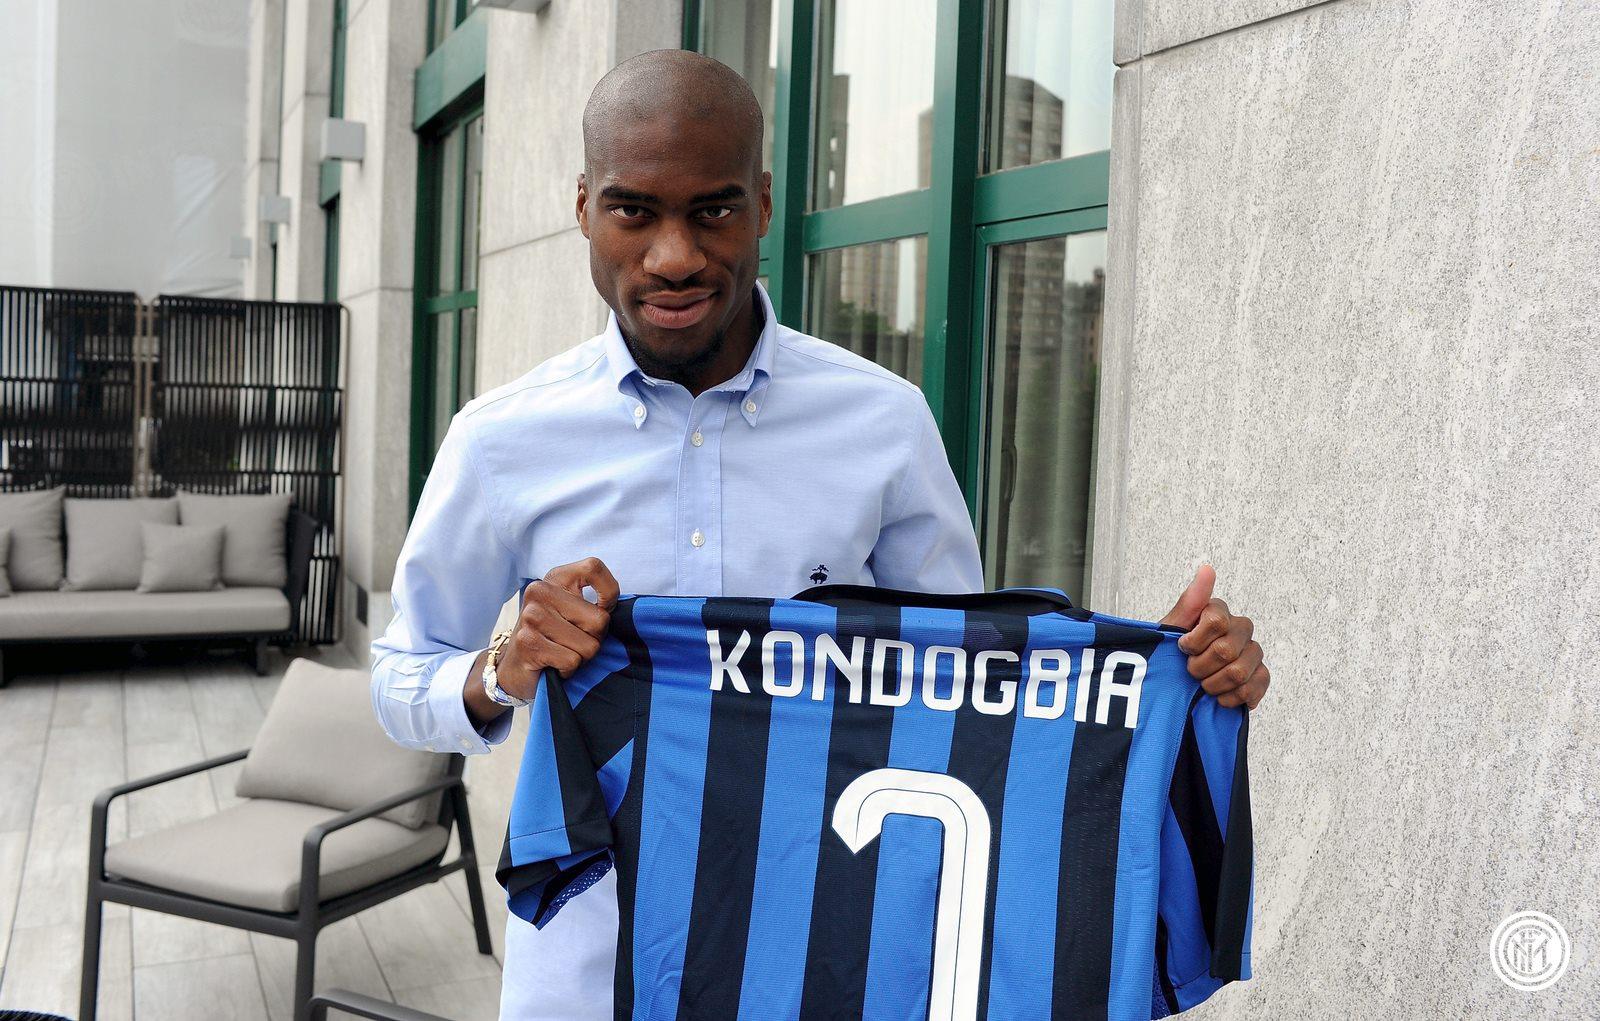 kondogbia signe à l'inter milan